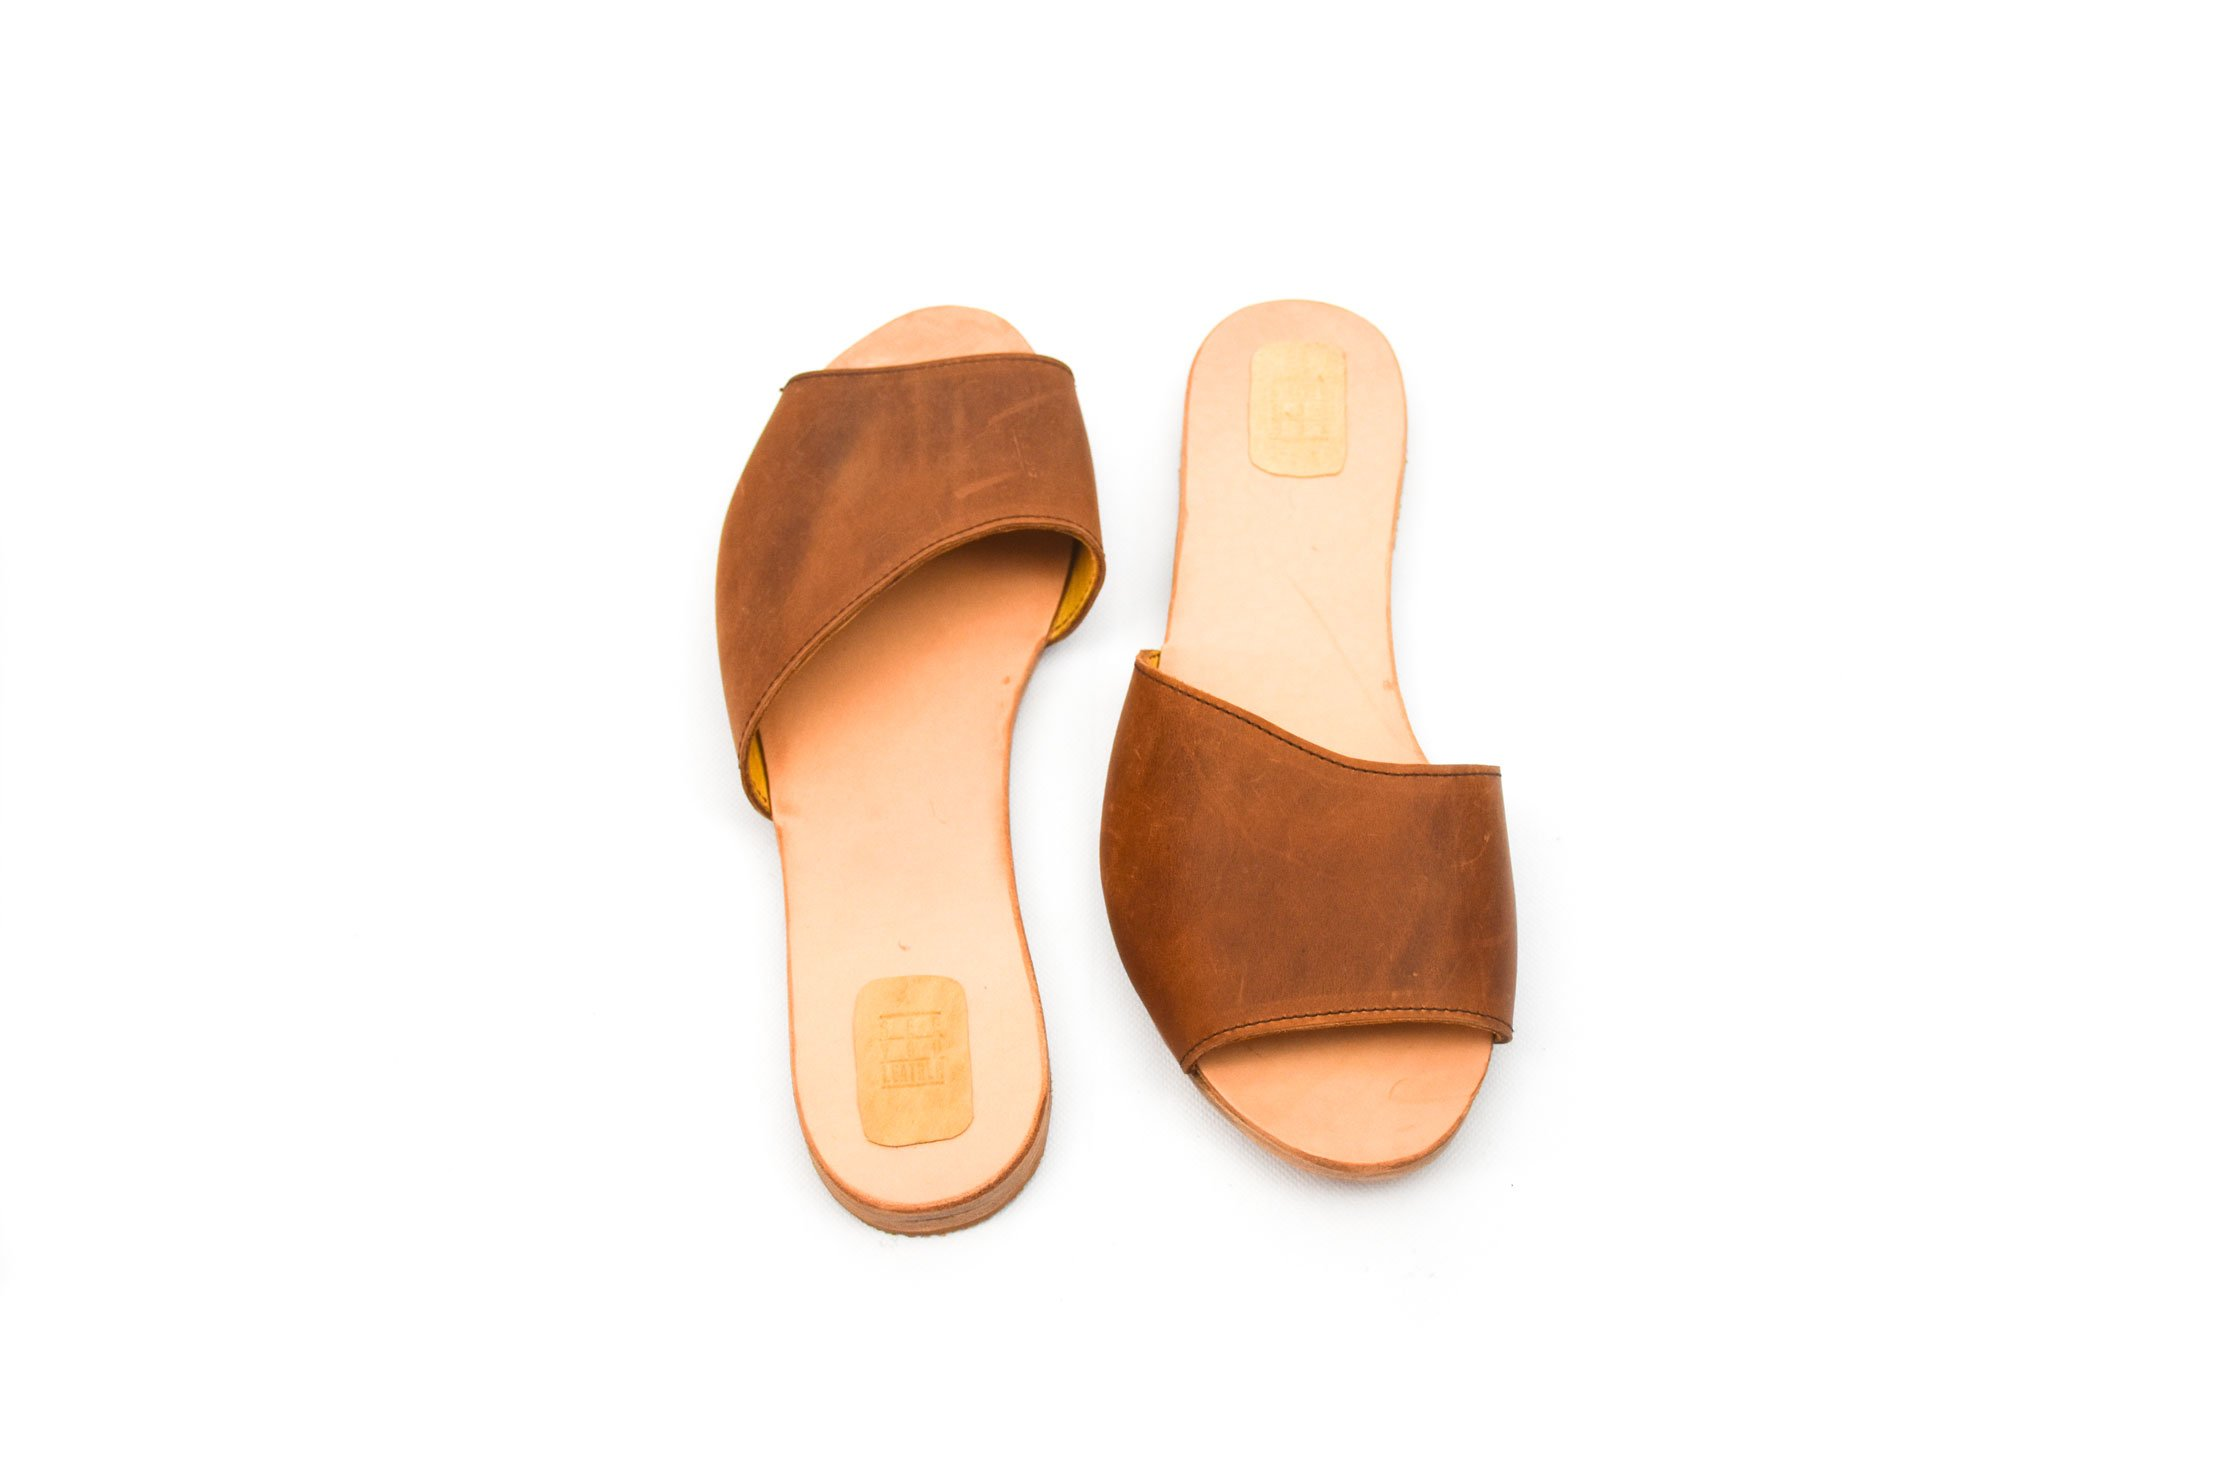 sandalia asimétrica cuero piel marrón handmade